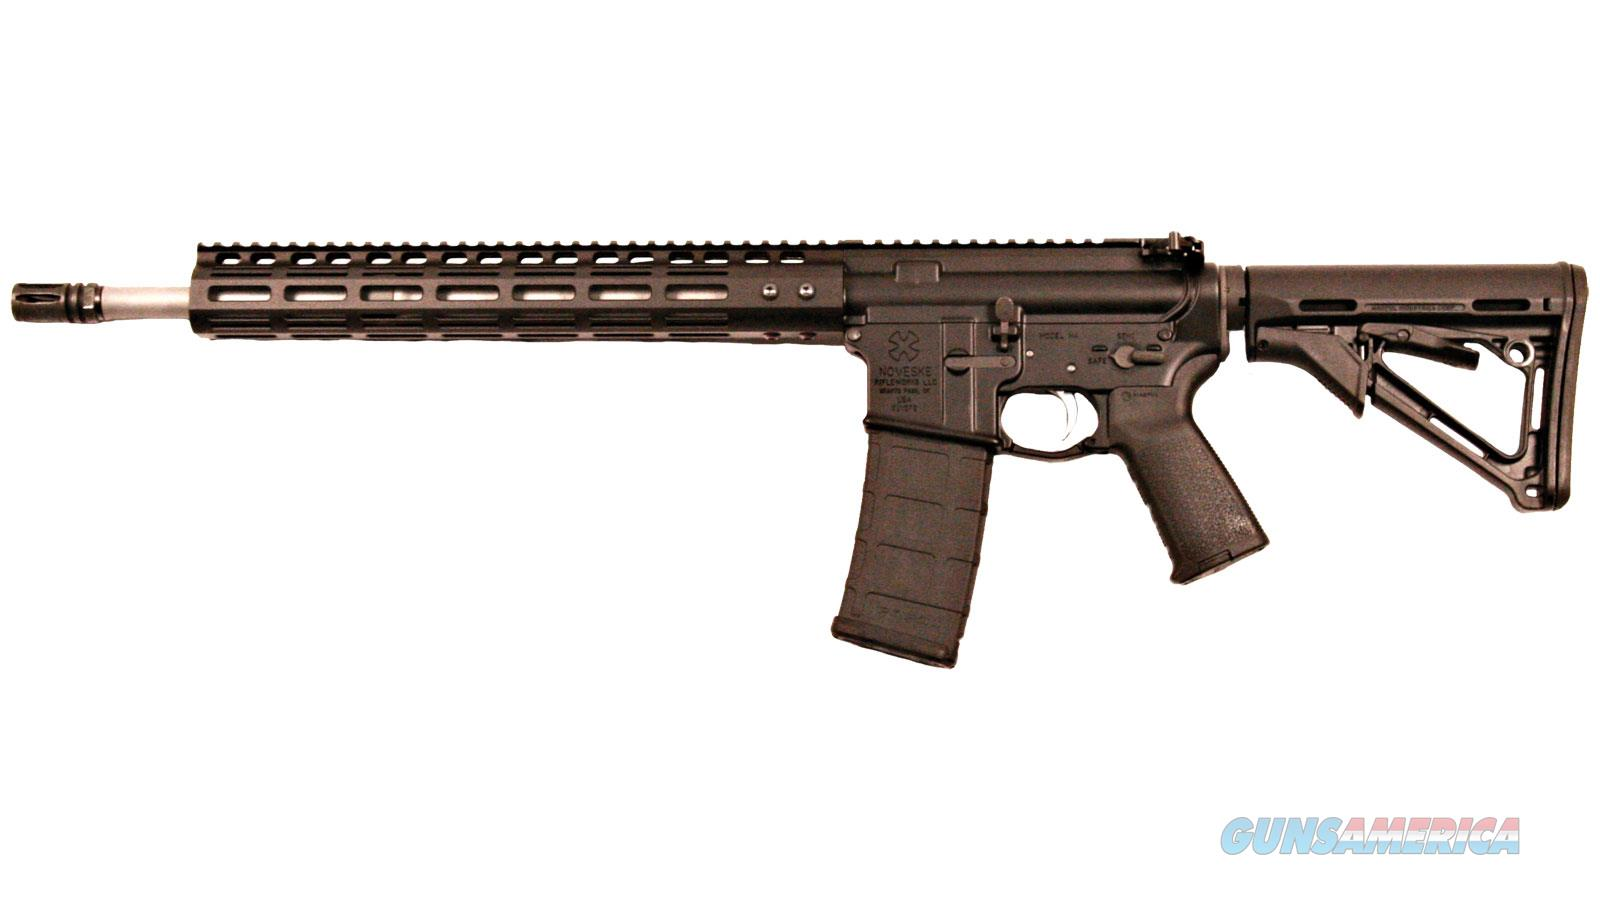 Noveske Rifleworks Llc Gen 1 Rogue Hunter M-Lok 02000402  Guns > Rifles > MN Misc Rifles